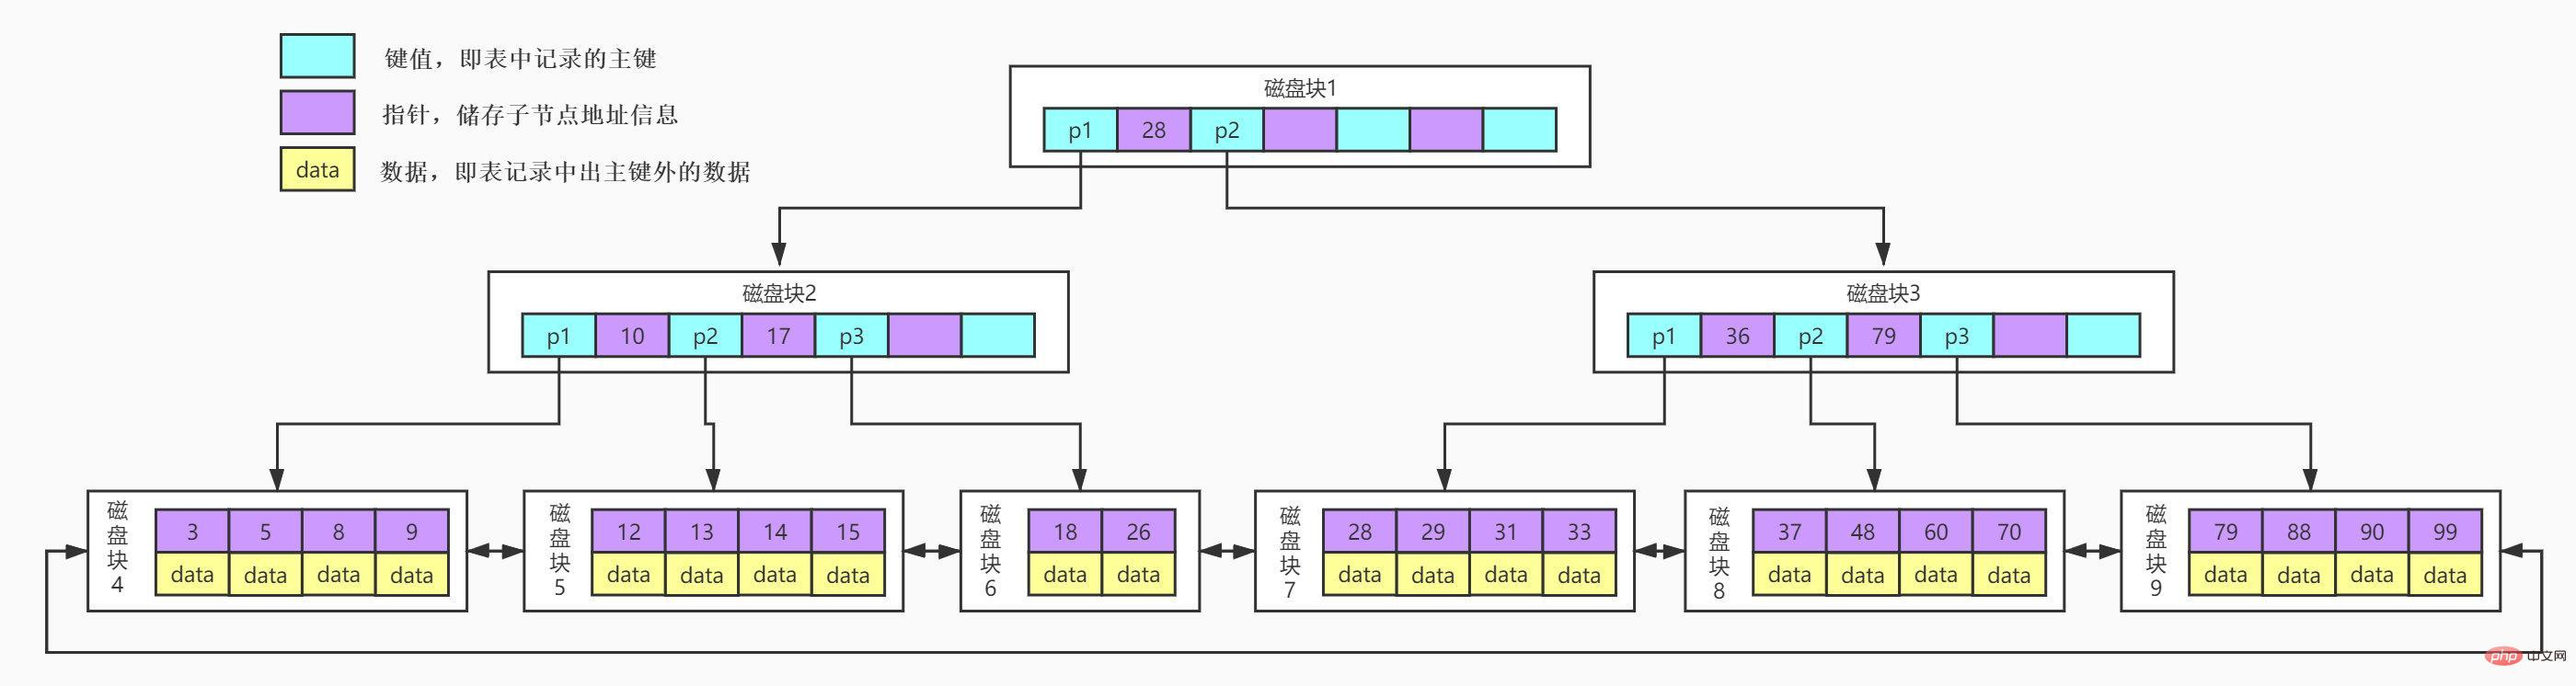 MySQL索引能让查询效率提高这么多原因是?_编程技术_亿码酷站插图5